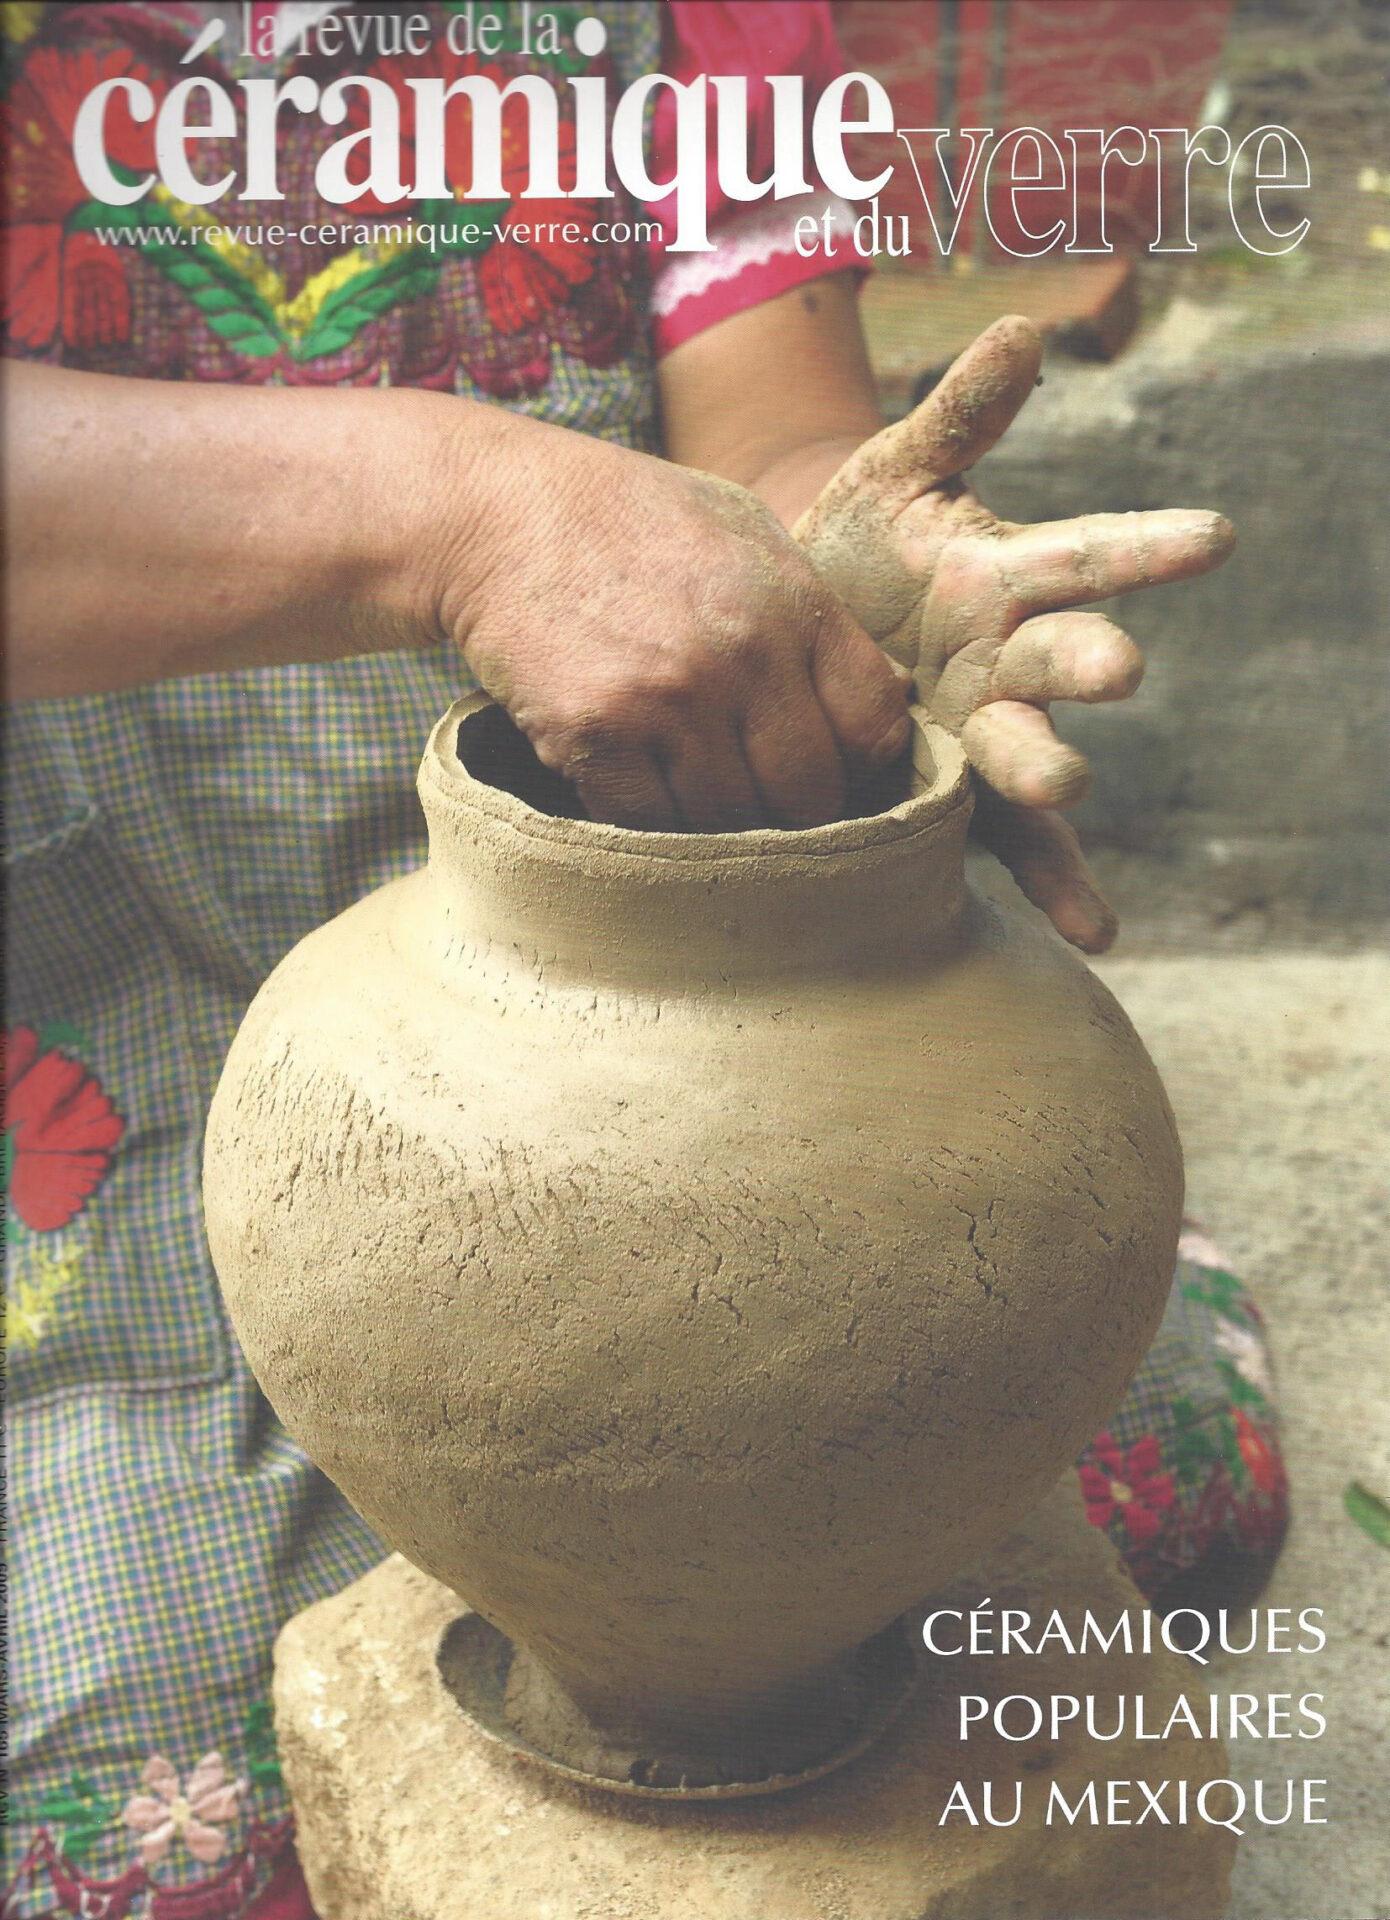 Ceramics Art and Perception (Australie) n° 70 - 2007_1_couverture